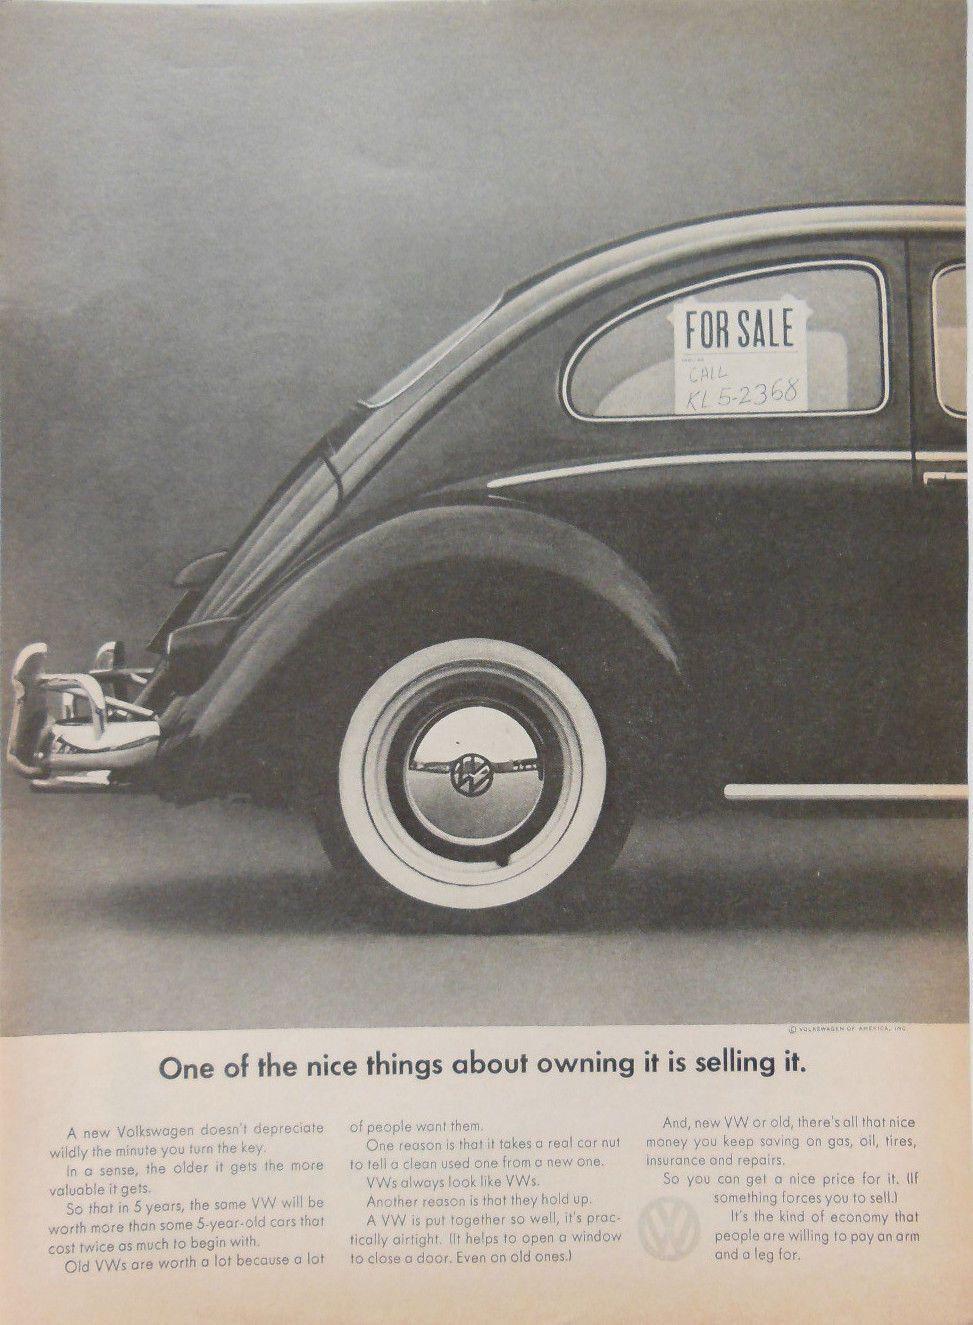 http://www.ebay.com.au/itm/VW-VOLKSWAGEN-BUG-BEETLE-AD-1960-original ...